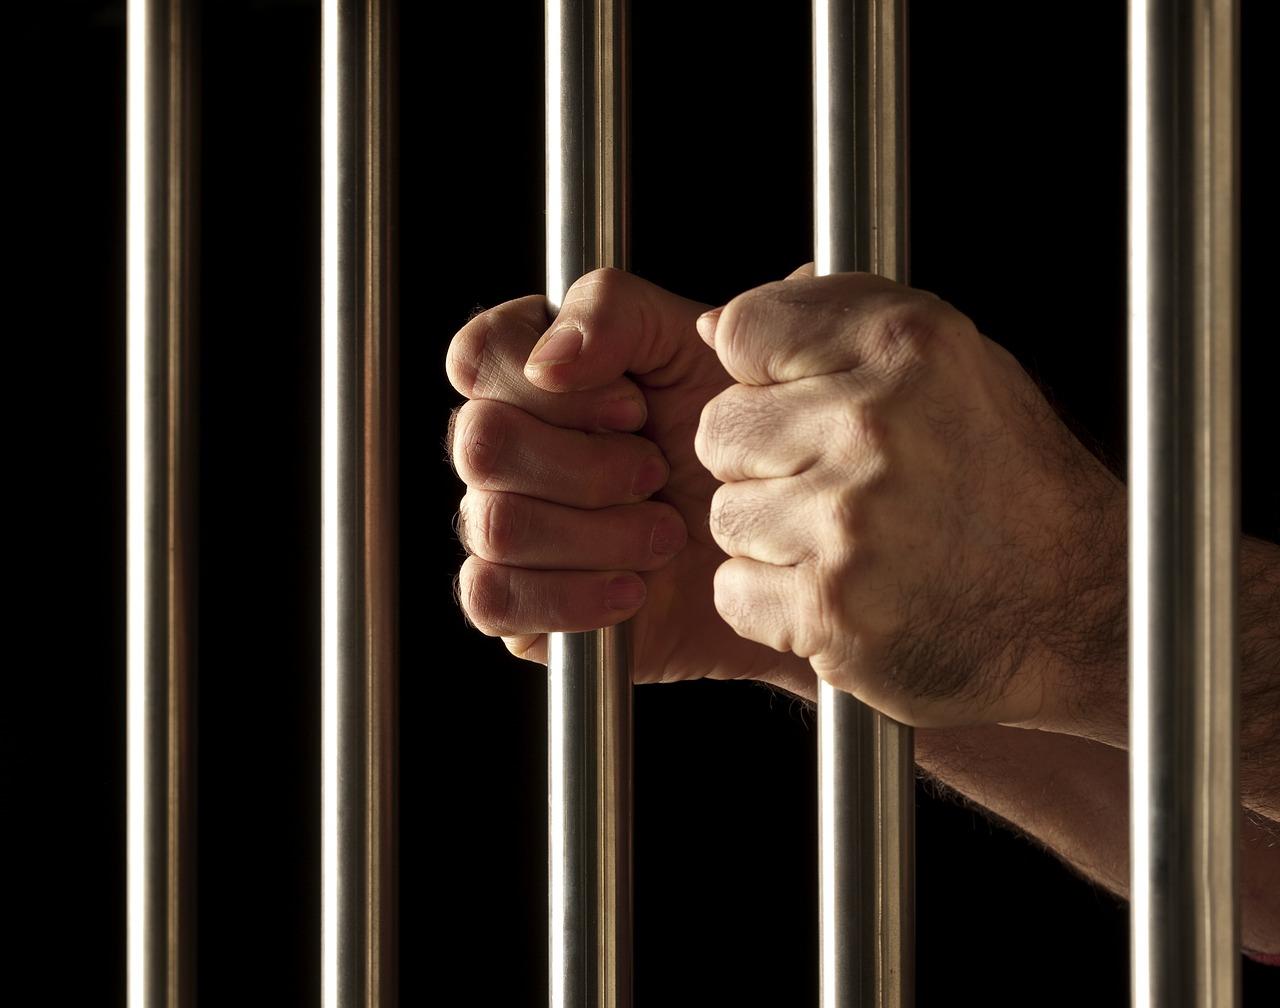 Hands grasping jail bars